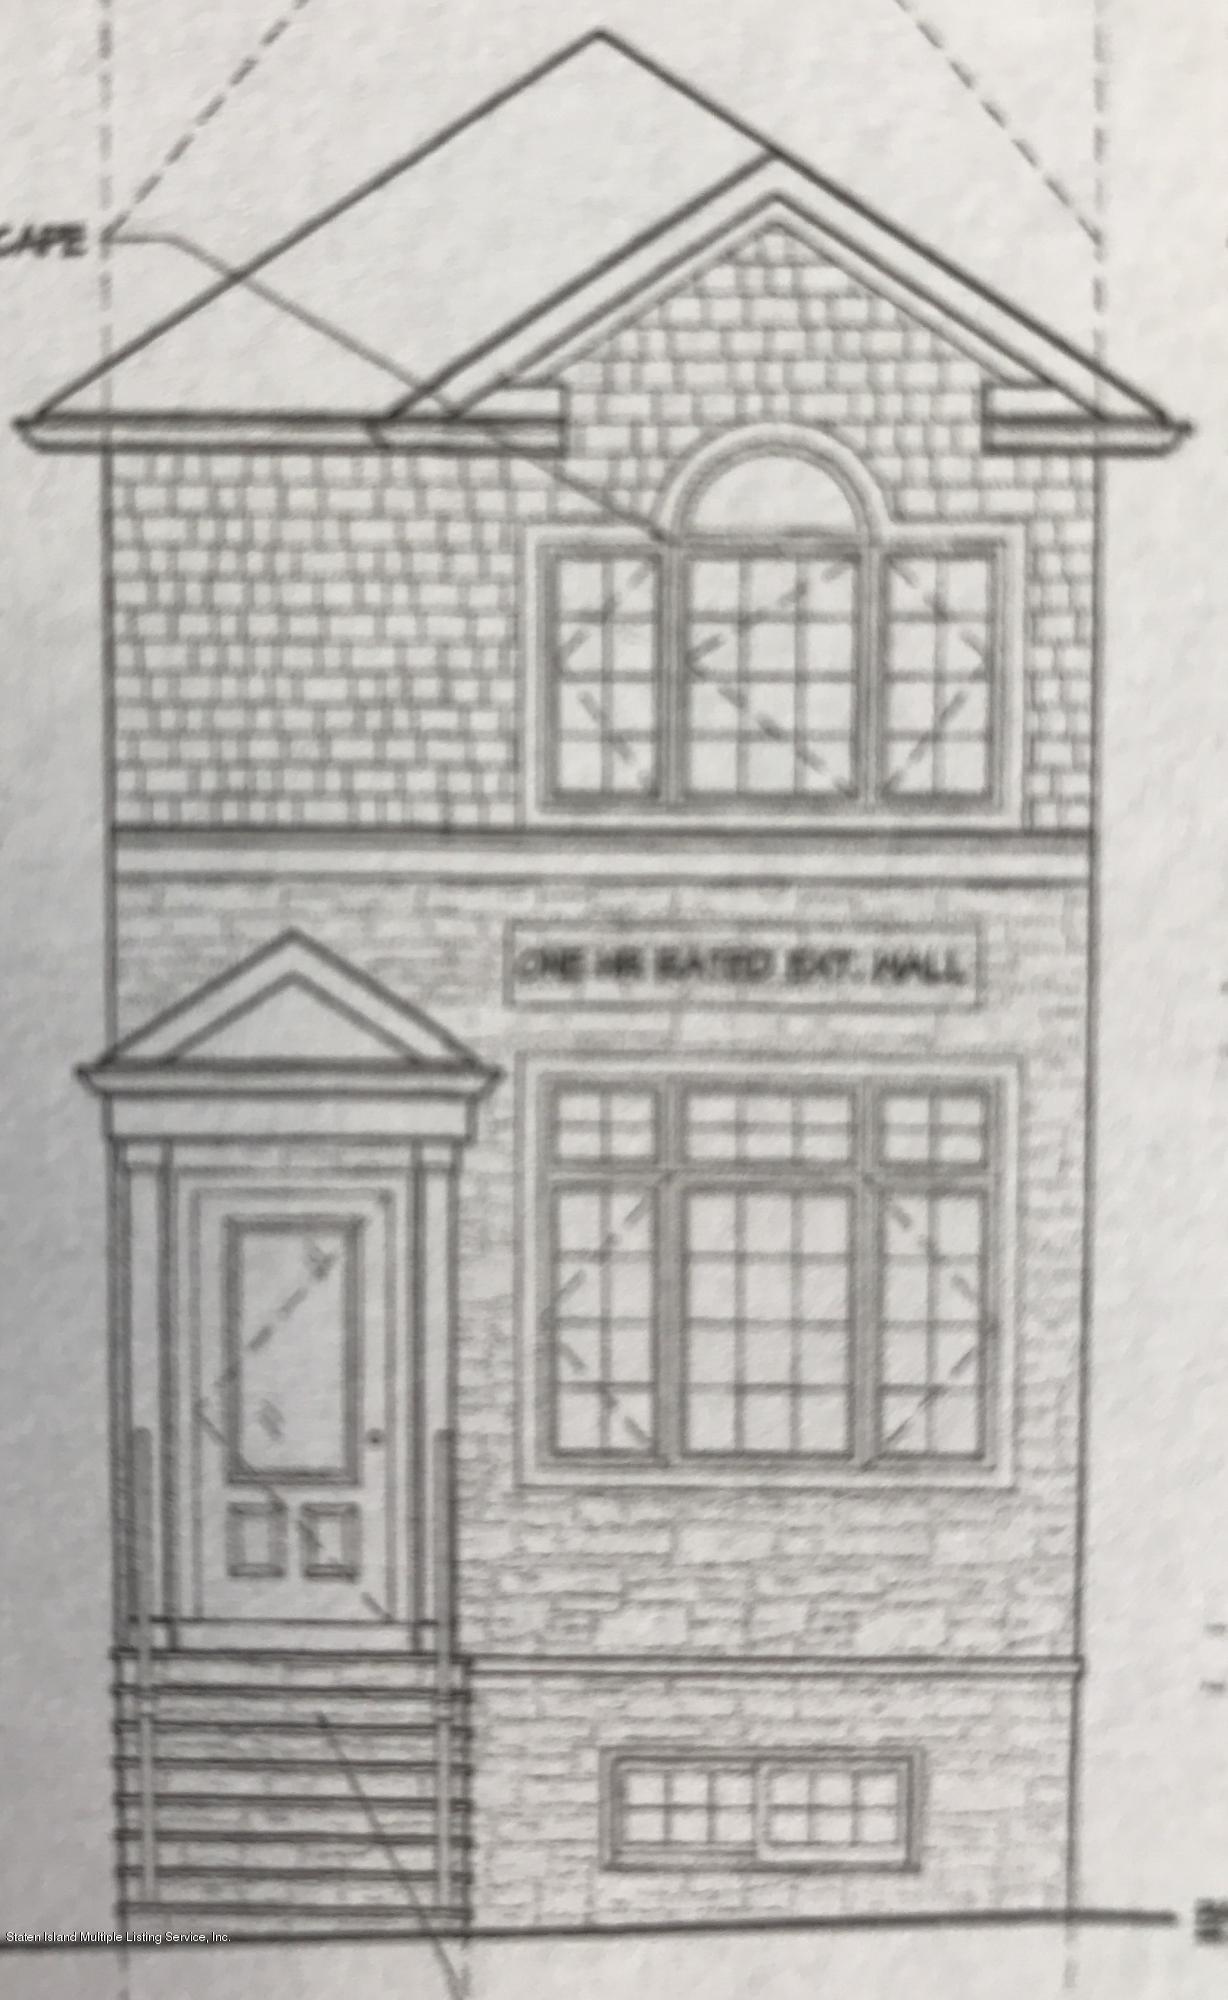 456 Villa Avenue,Staten Island,New York,10302,United States,3 Bedrooms Bedrooms,7 Rooms Rooms,4 BathroomsBathrooms,Residential,Villa,1124424